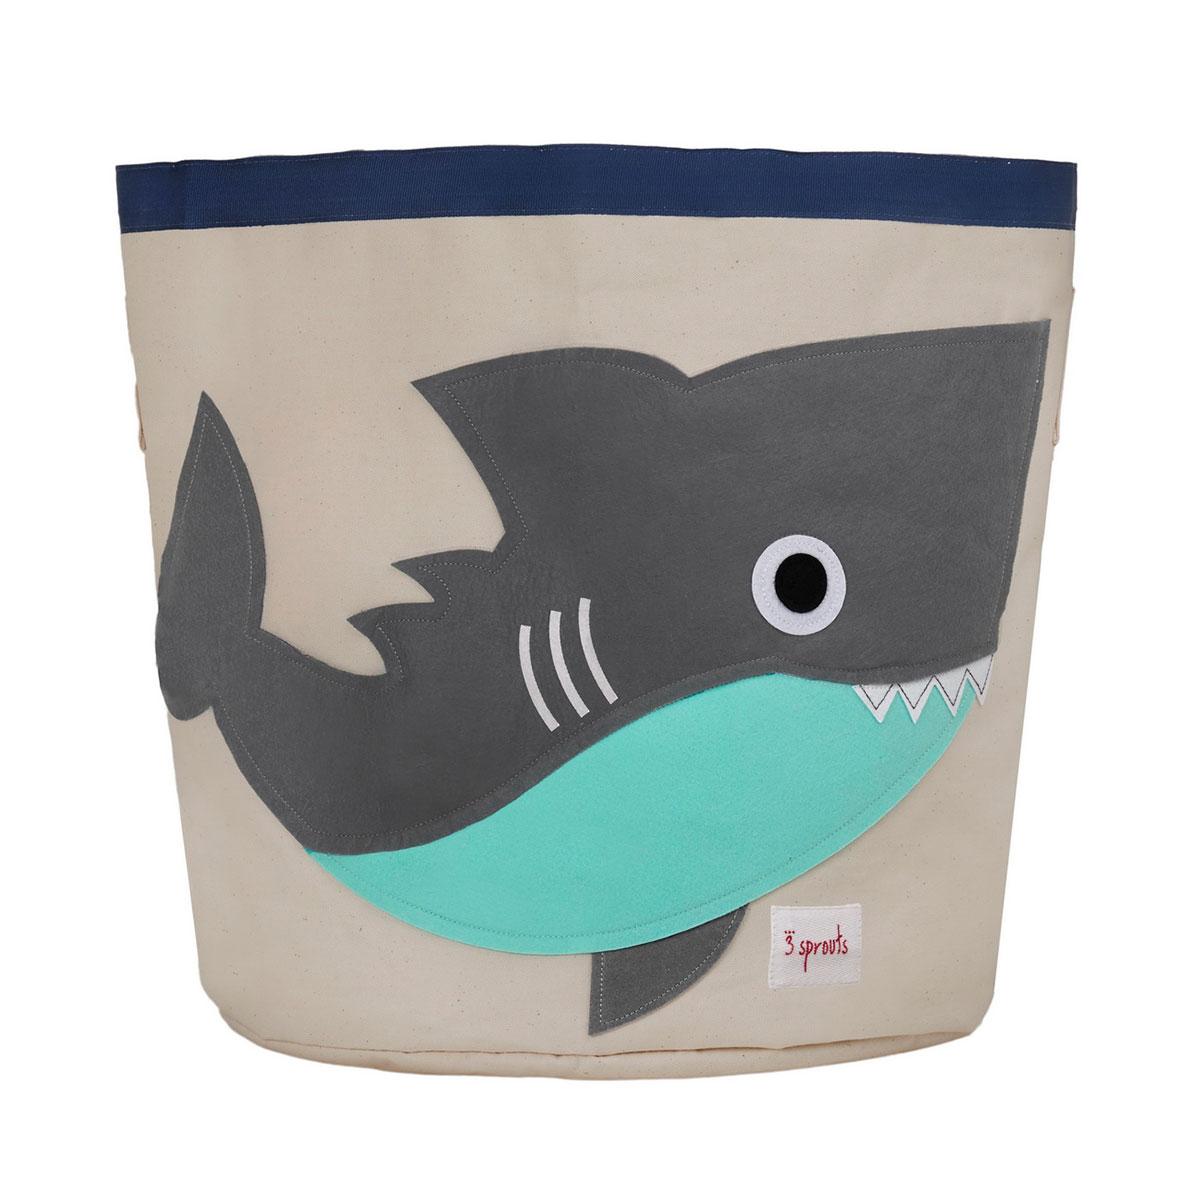 Корзина для хранения 3 Sprouts Серая акула (Grey Shark SPR213) Арт. 00022<br>